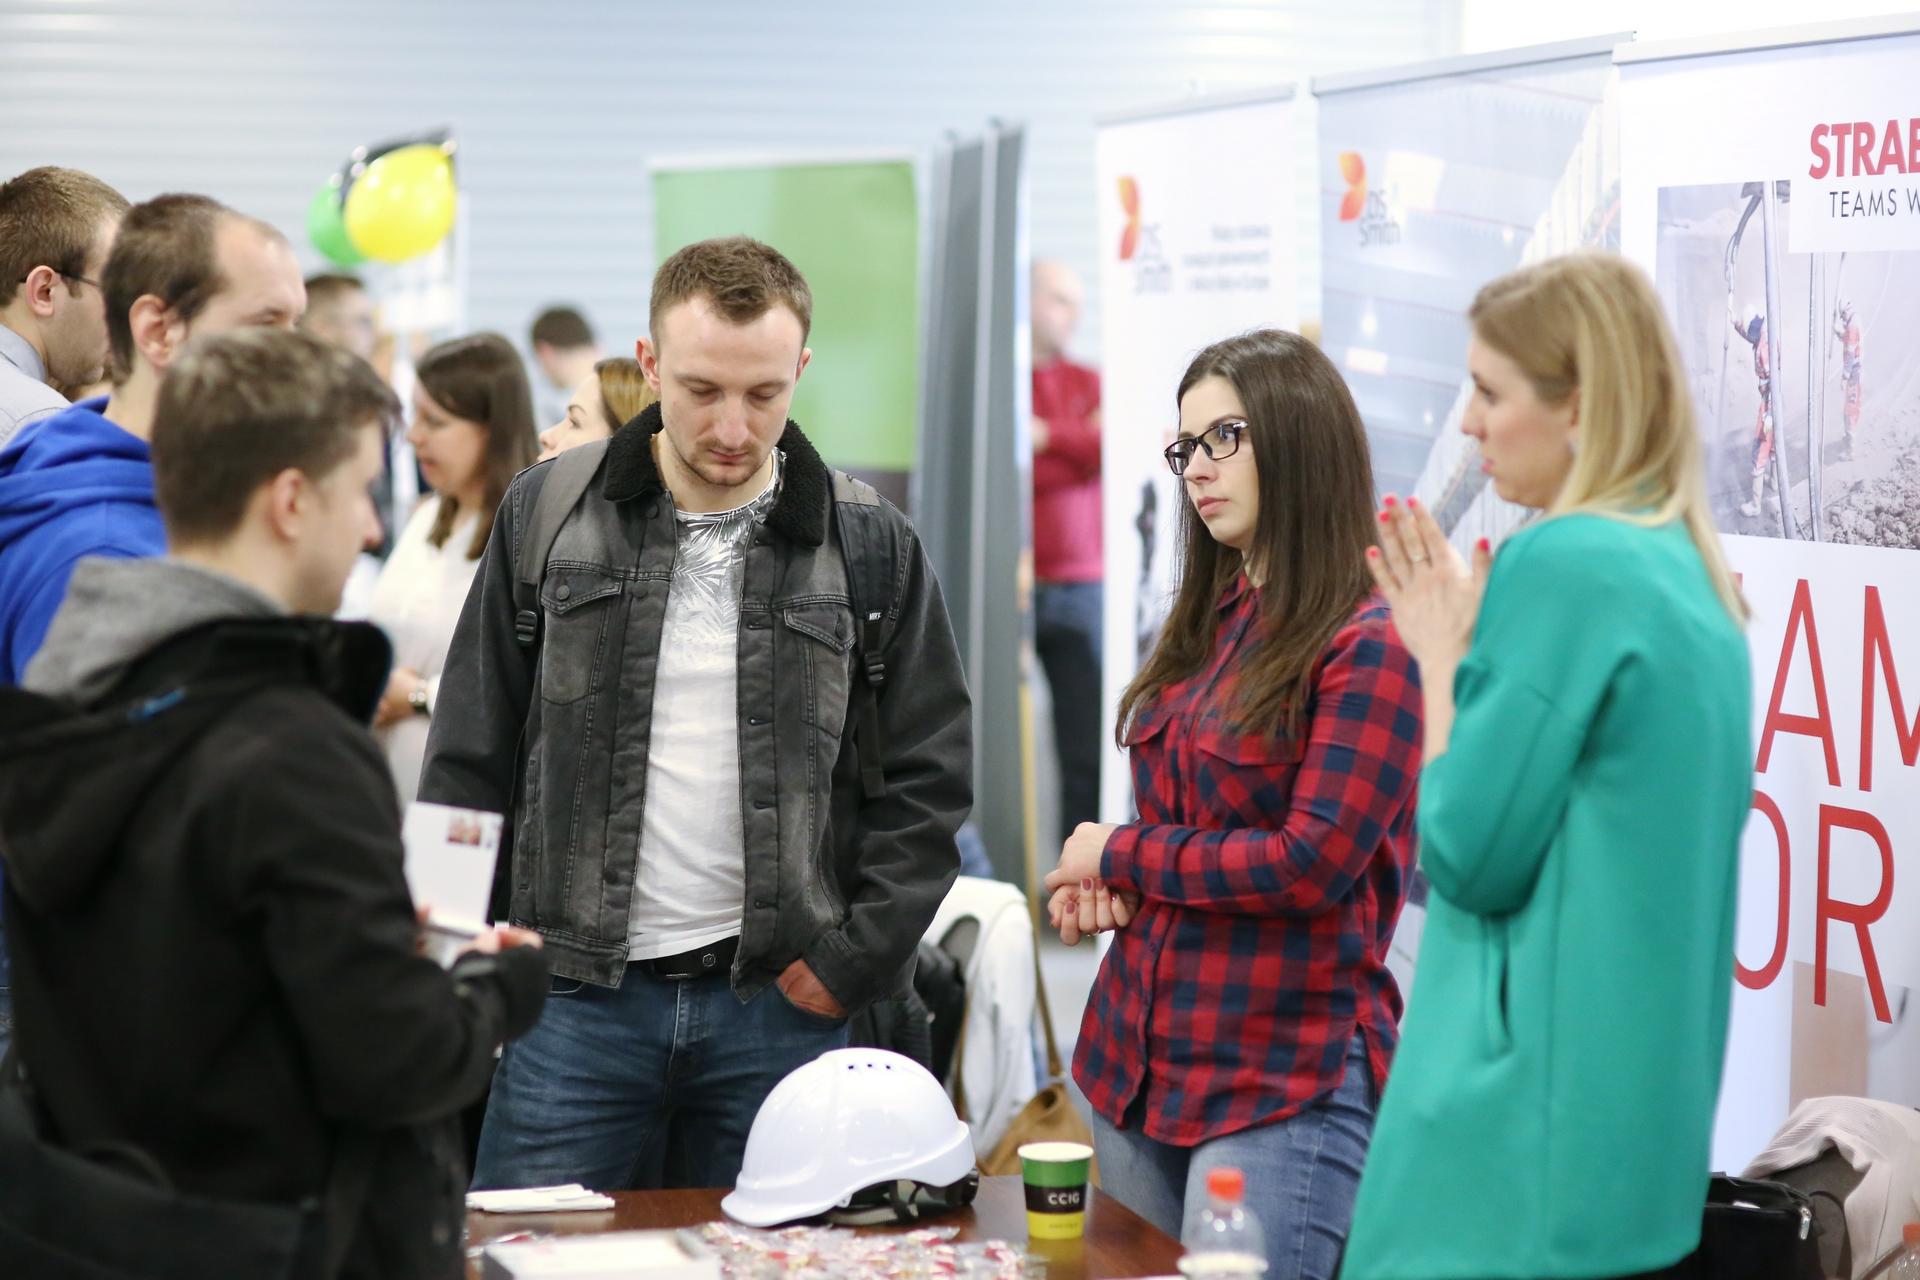 Studenckie Targi Pracy i Praktyk, Żaklinalia